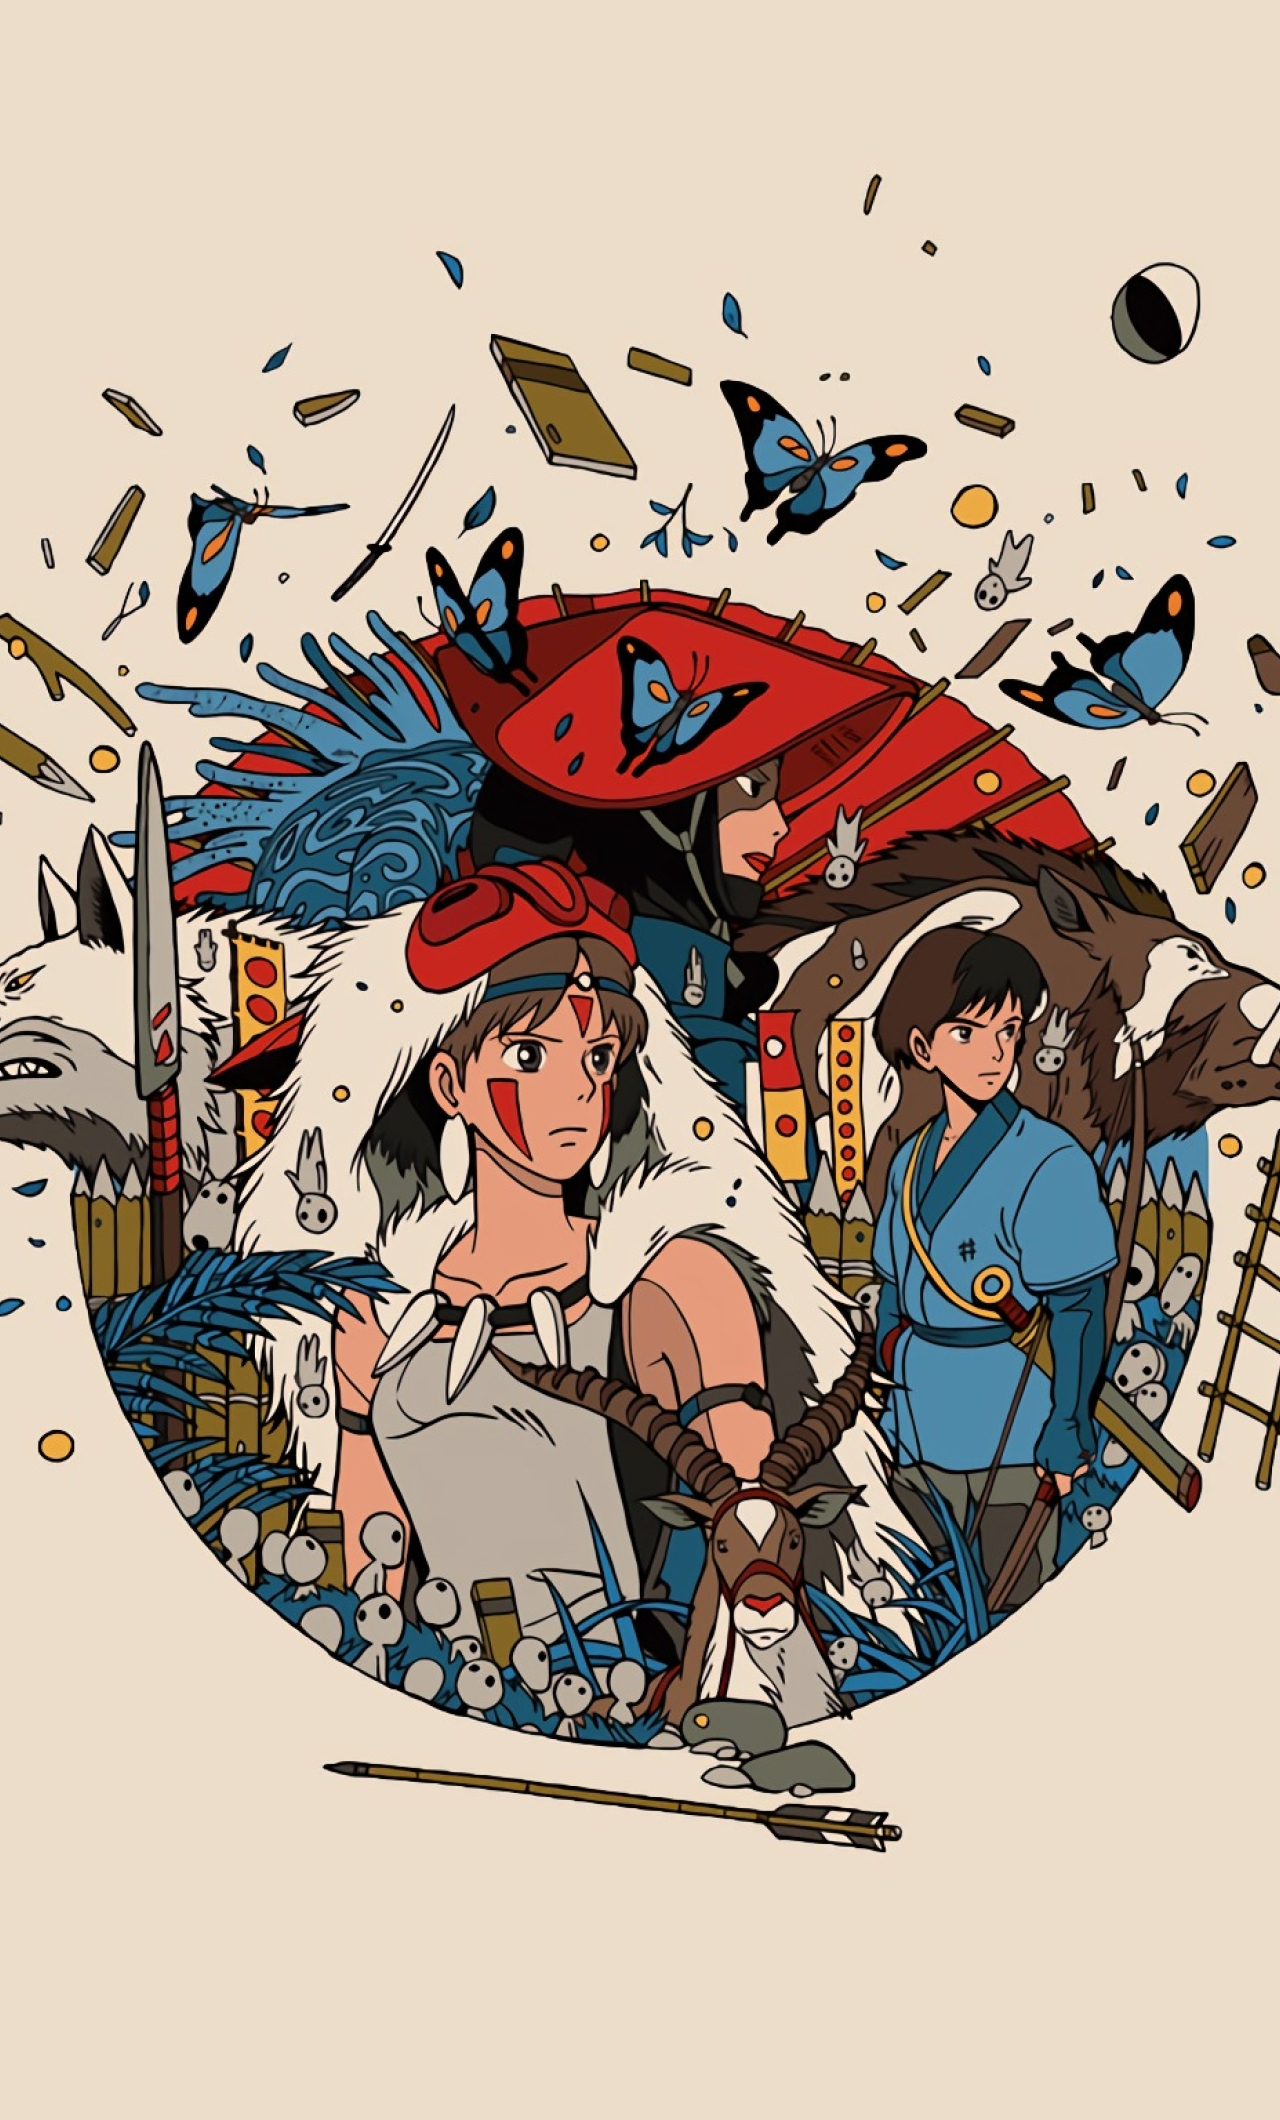 1280x2120 Princess Mononoke Iphone 6 Plus Wallpaper Hd Anime 4k Wallpapers Images Photos And Background